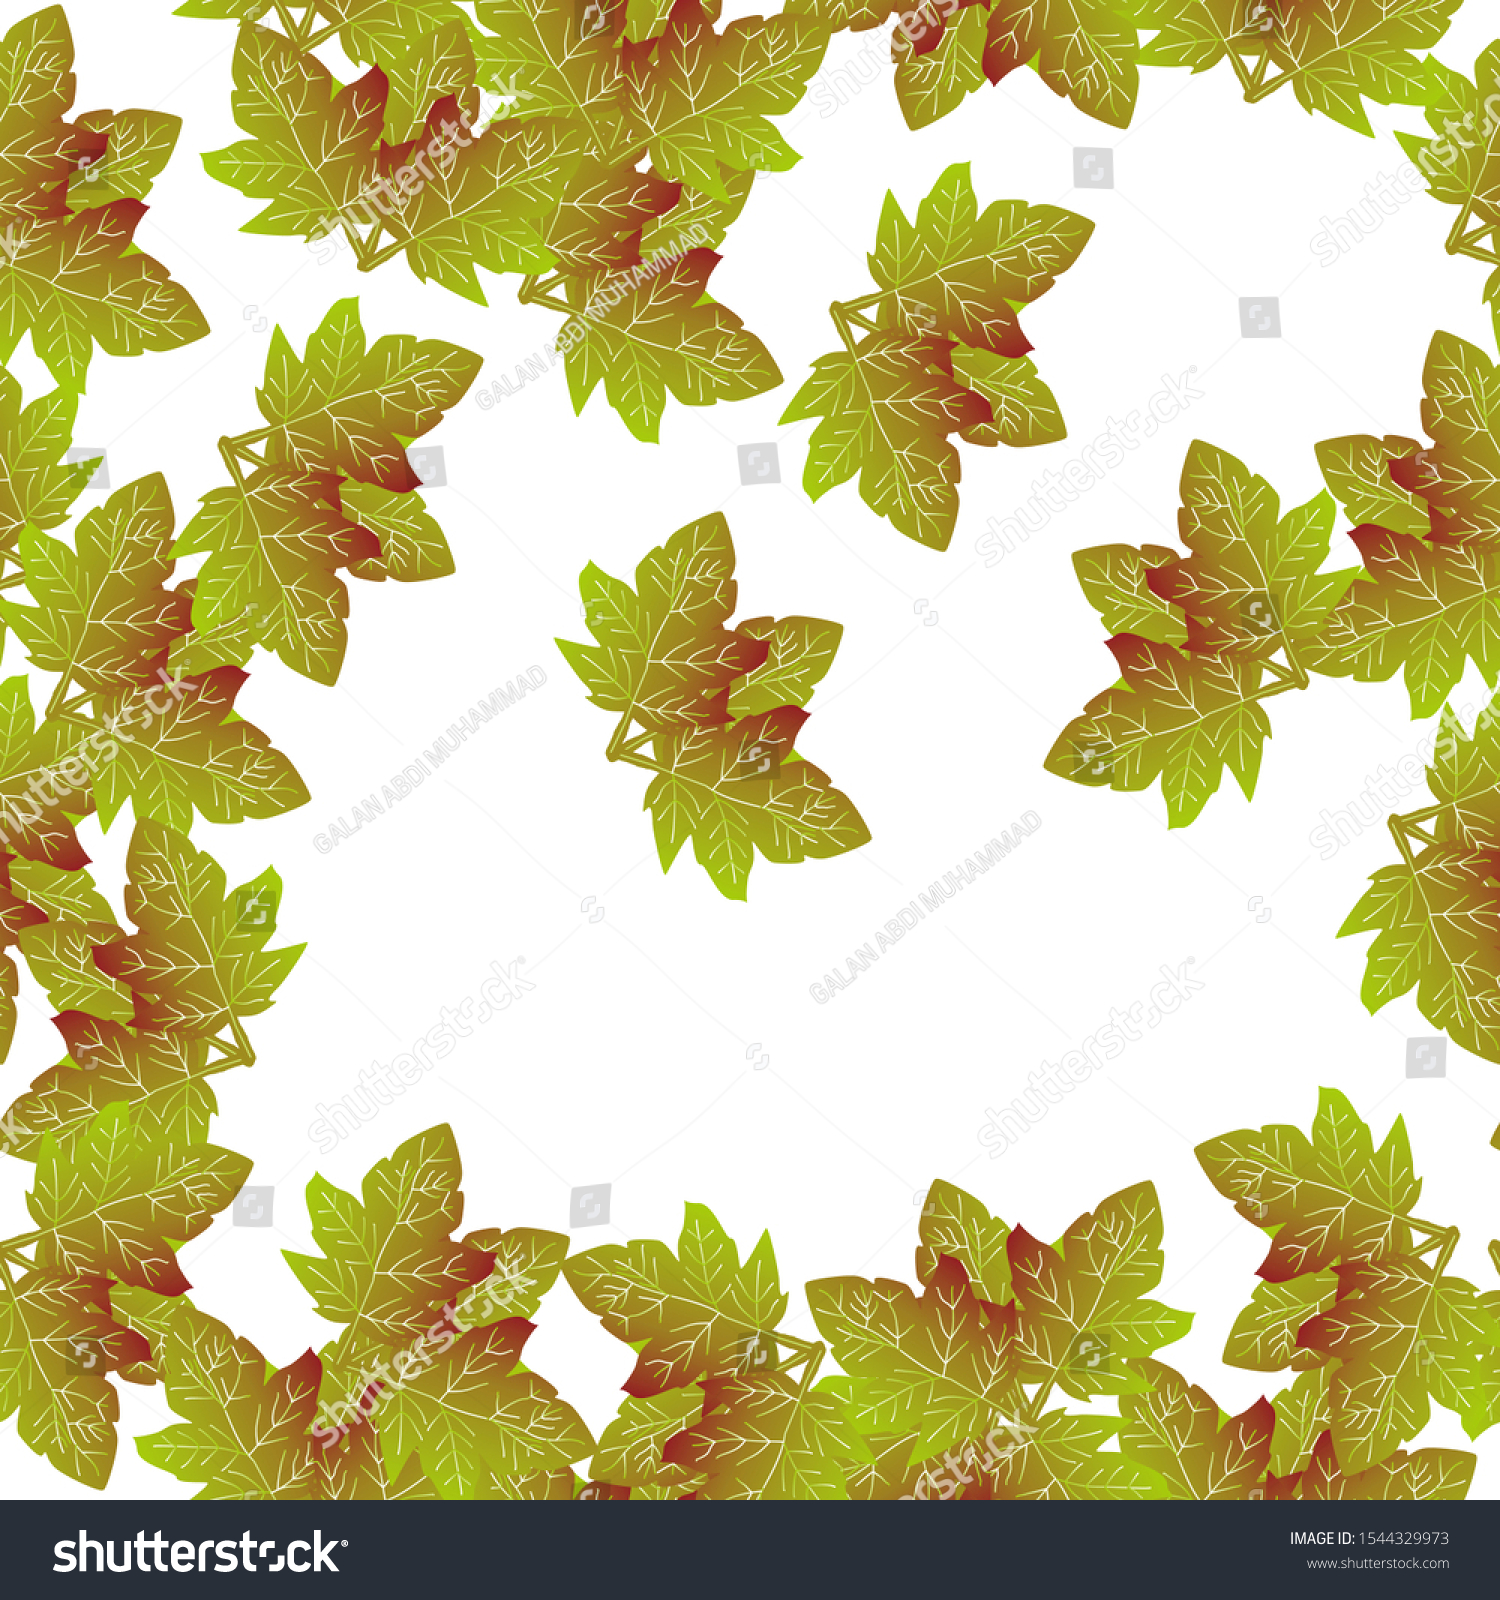 Autumn Seamless Pattern Leaf Autumn Leaf Stock Vector Royalty Free 1544329973